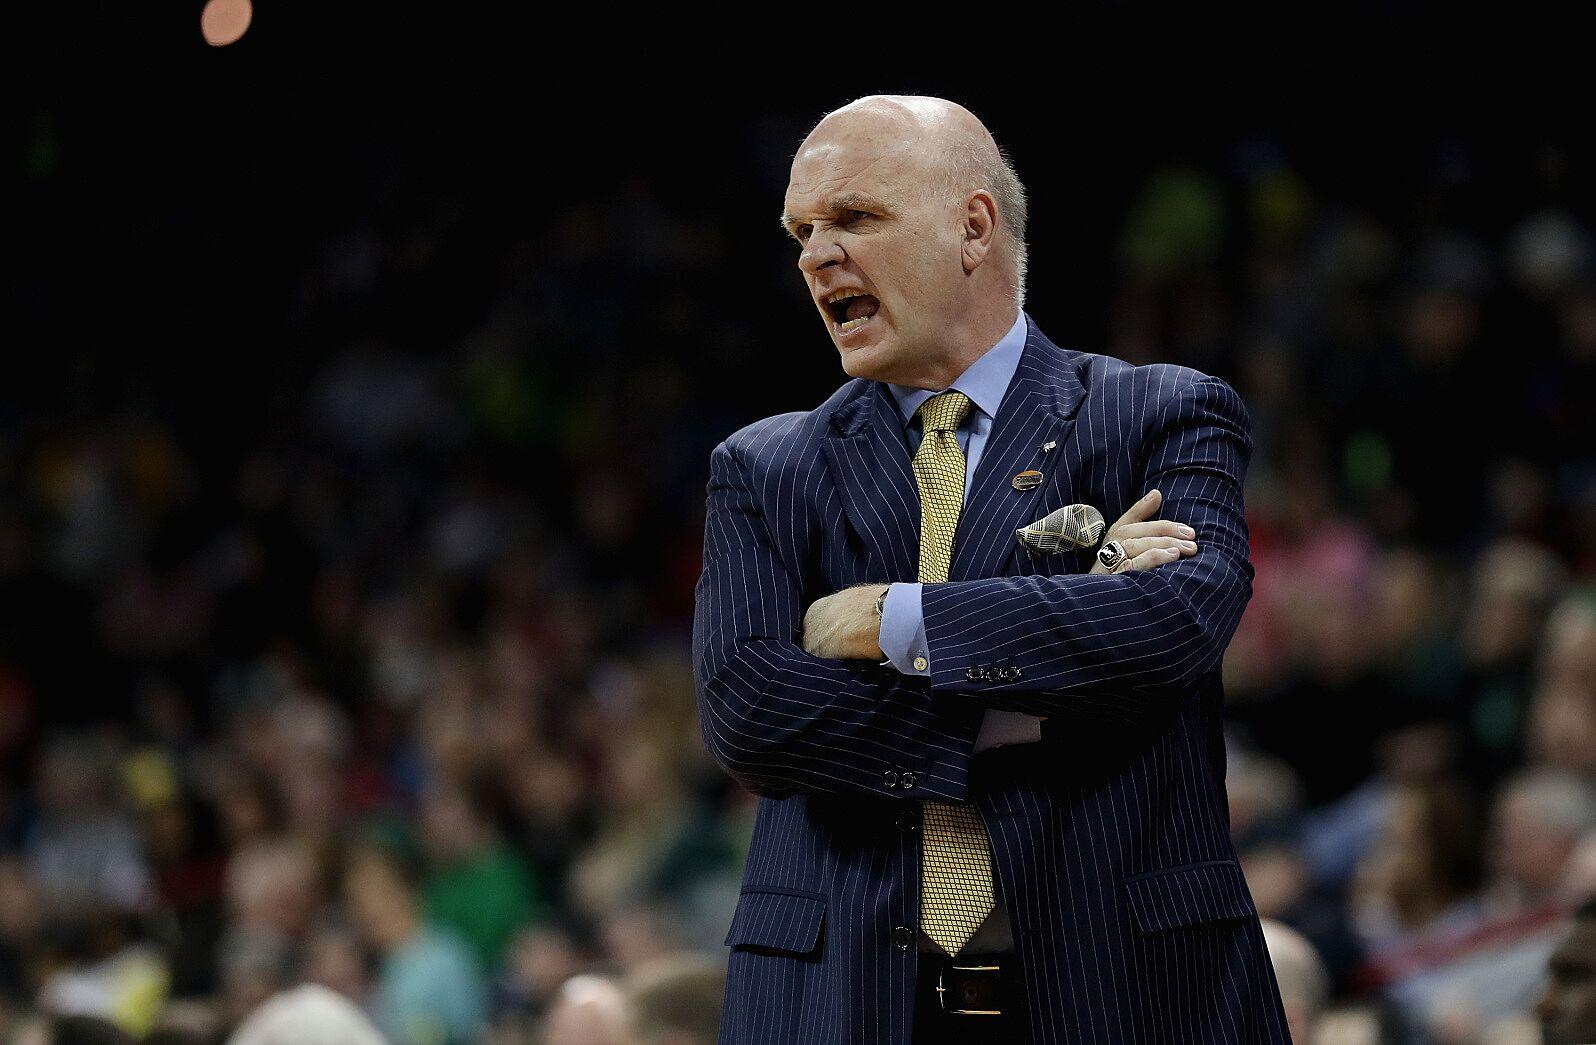 Michigan Basketball: Grading Juwan Howard's assistant coaches